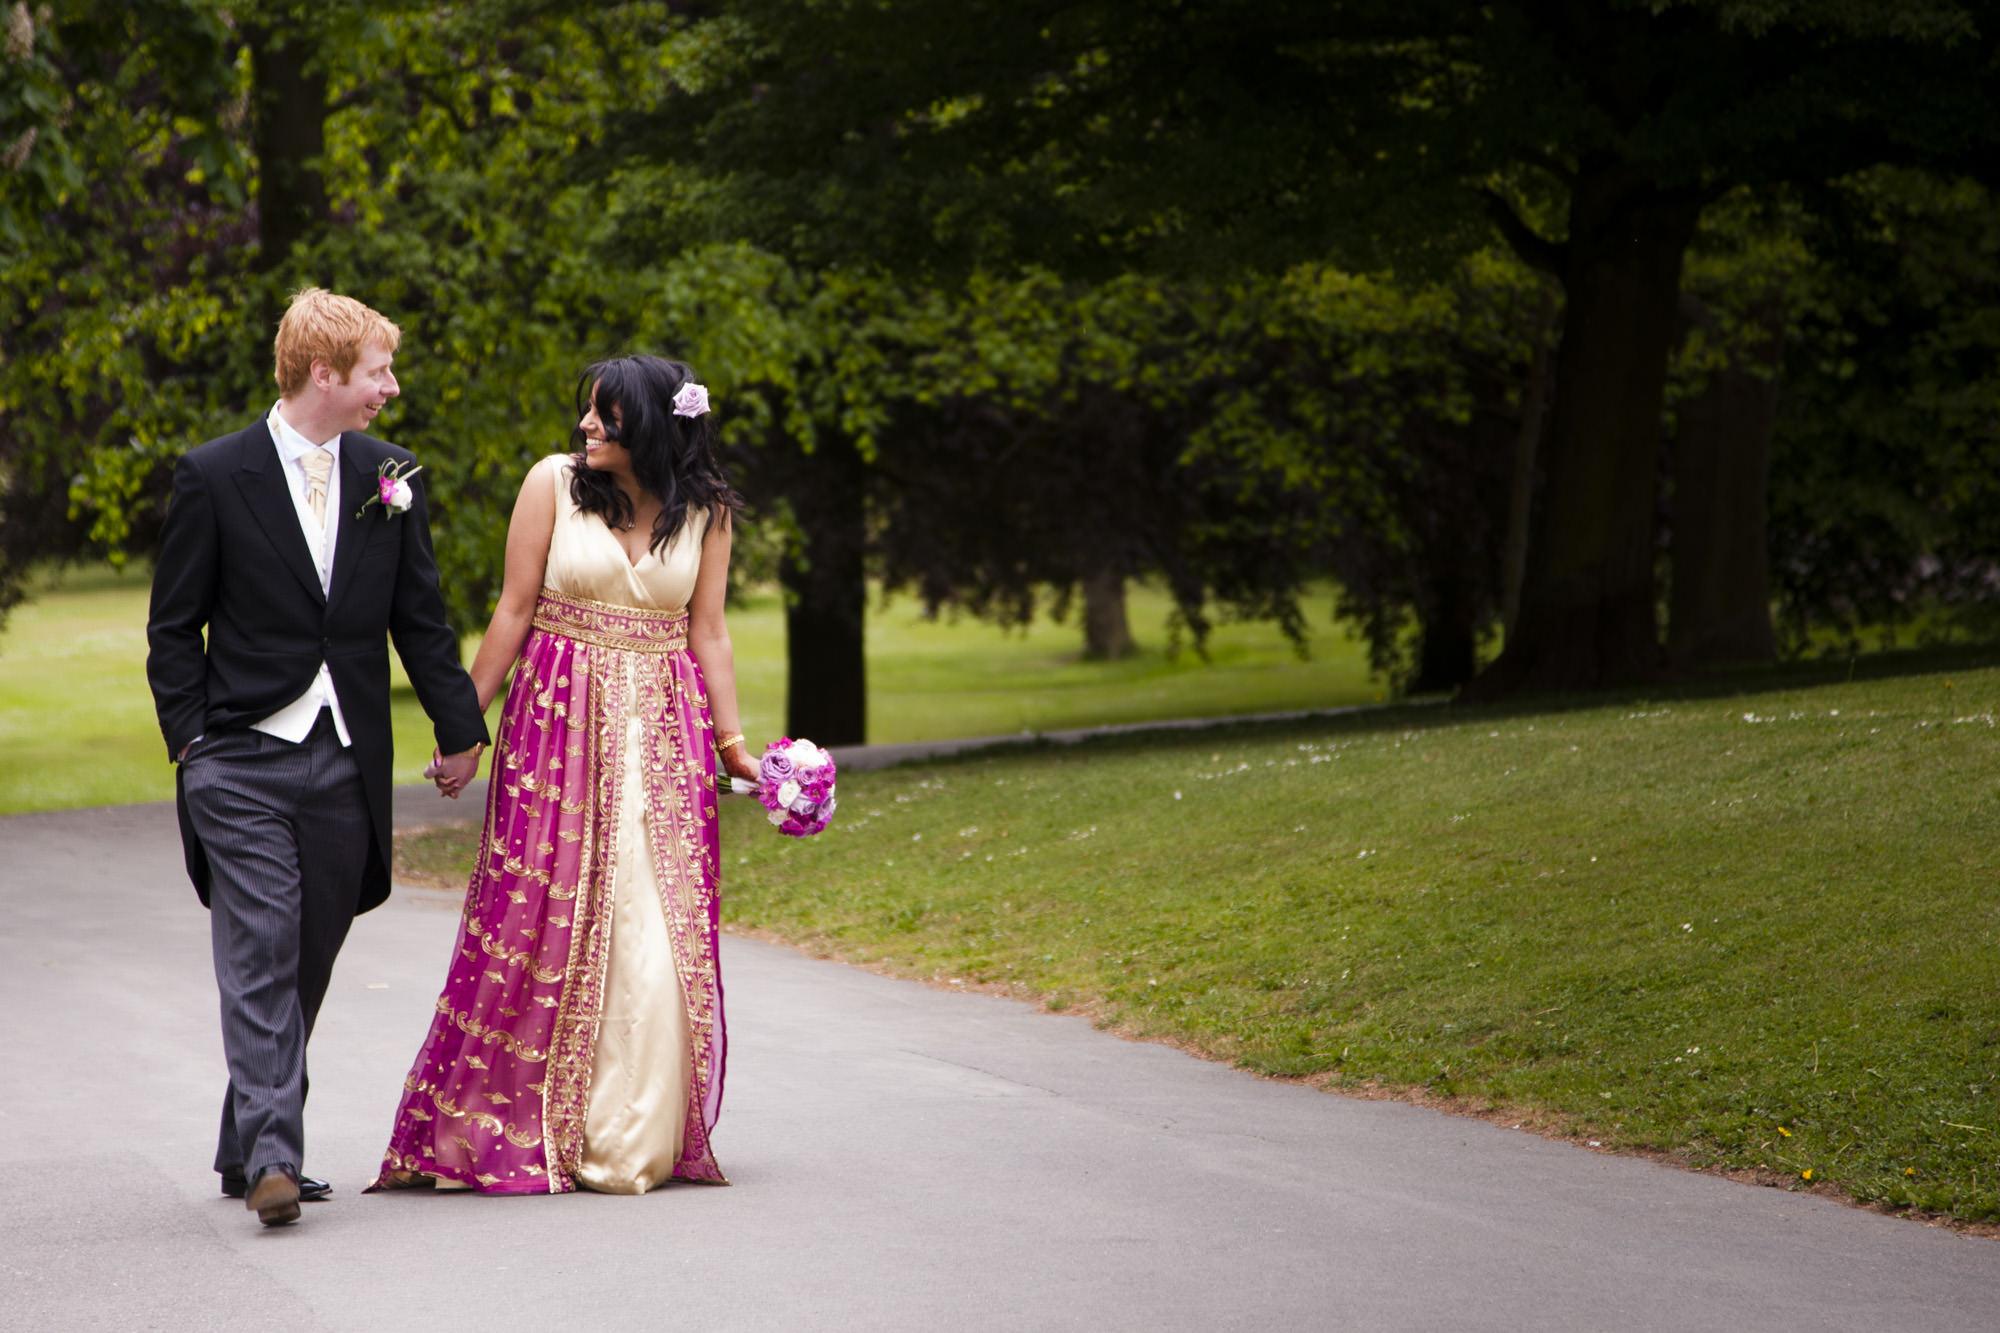 cambridge-wedding-photographer-io-1212-191.jpg